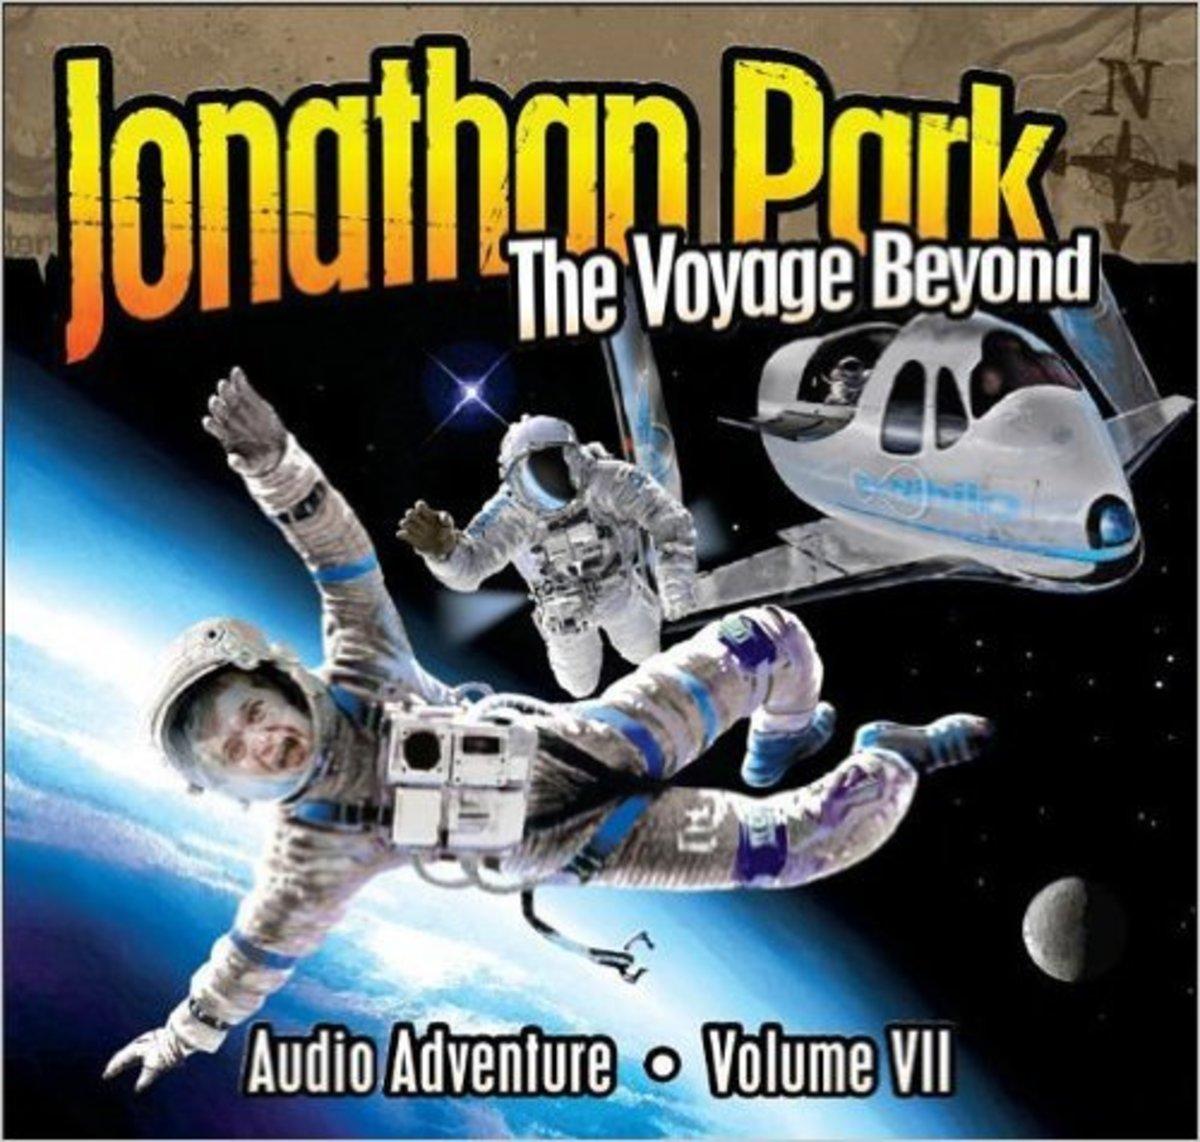 The Voyage Beyond (Jonathan Park Radio Drama) Audio CD by Pat Roy and Douglas W. Phillips - Image credit: amazon.com